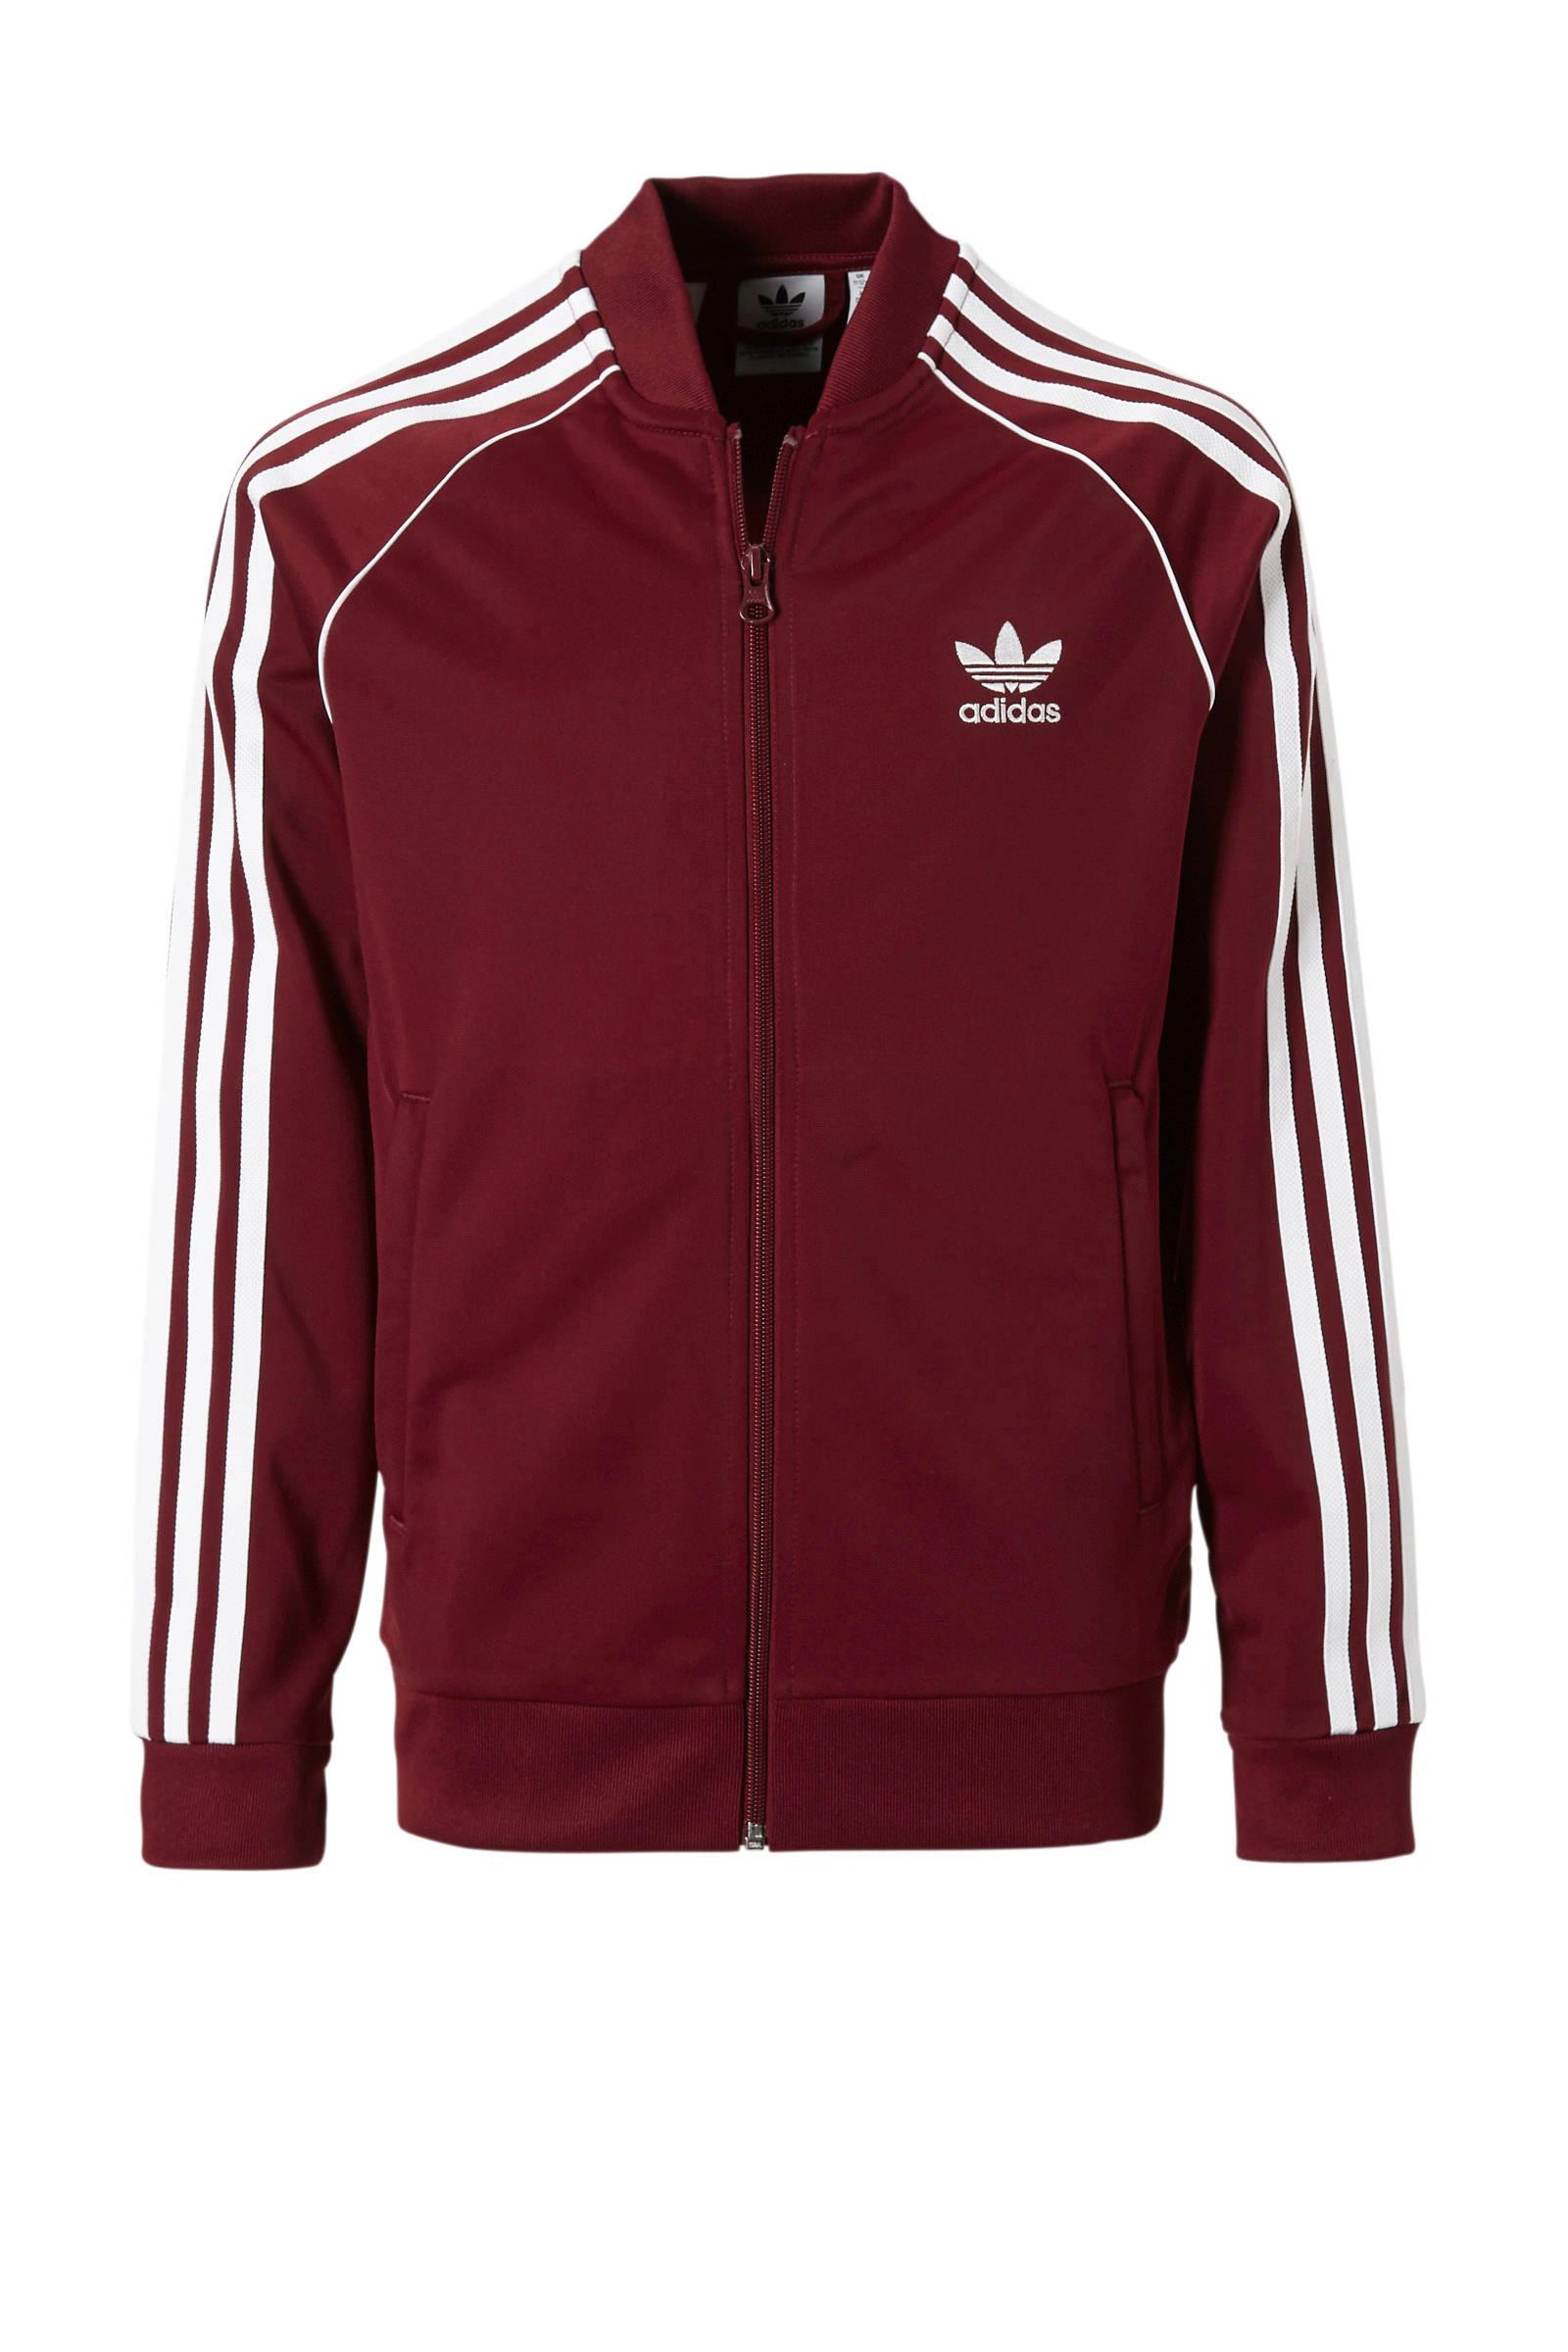 adidas Originals vest rozewit | wehkamp